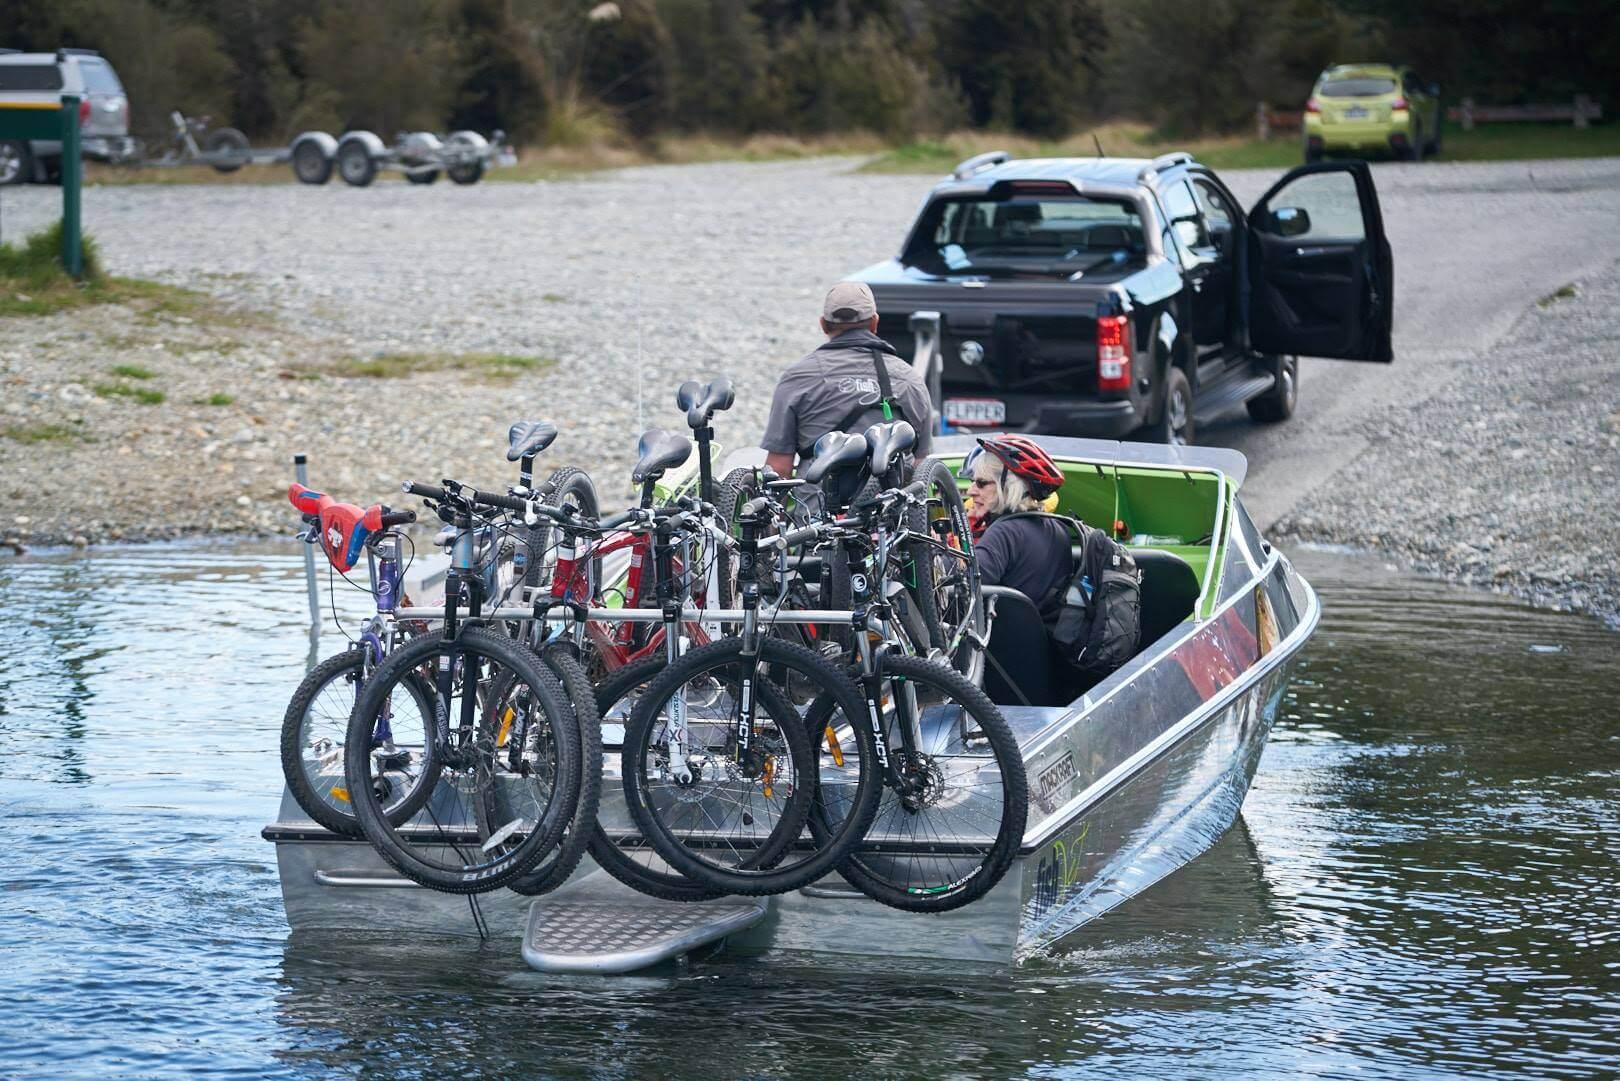 Fiordland-lodge-boat-bikes.jpg